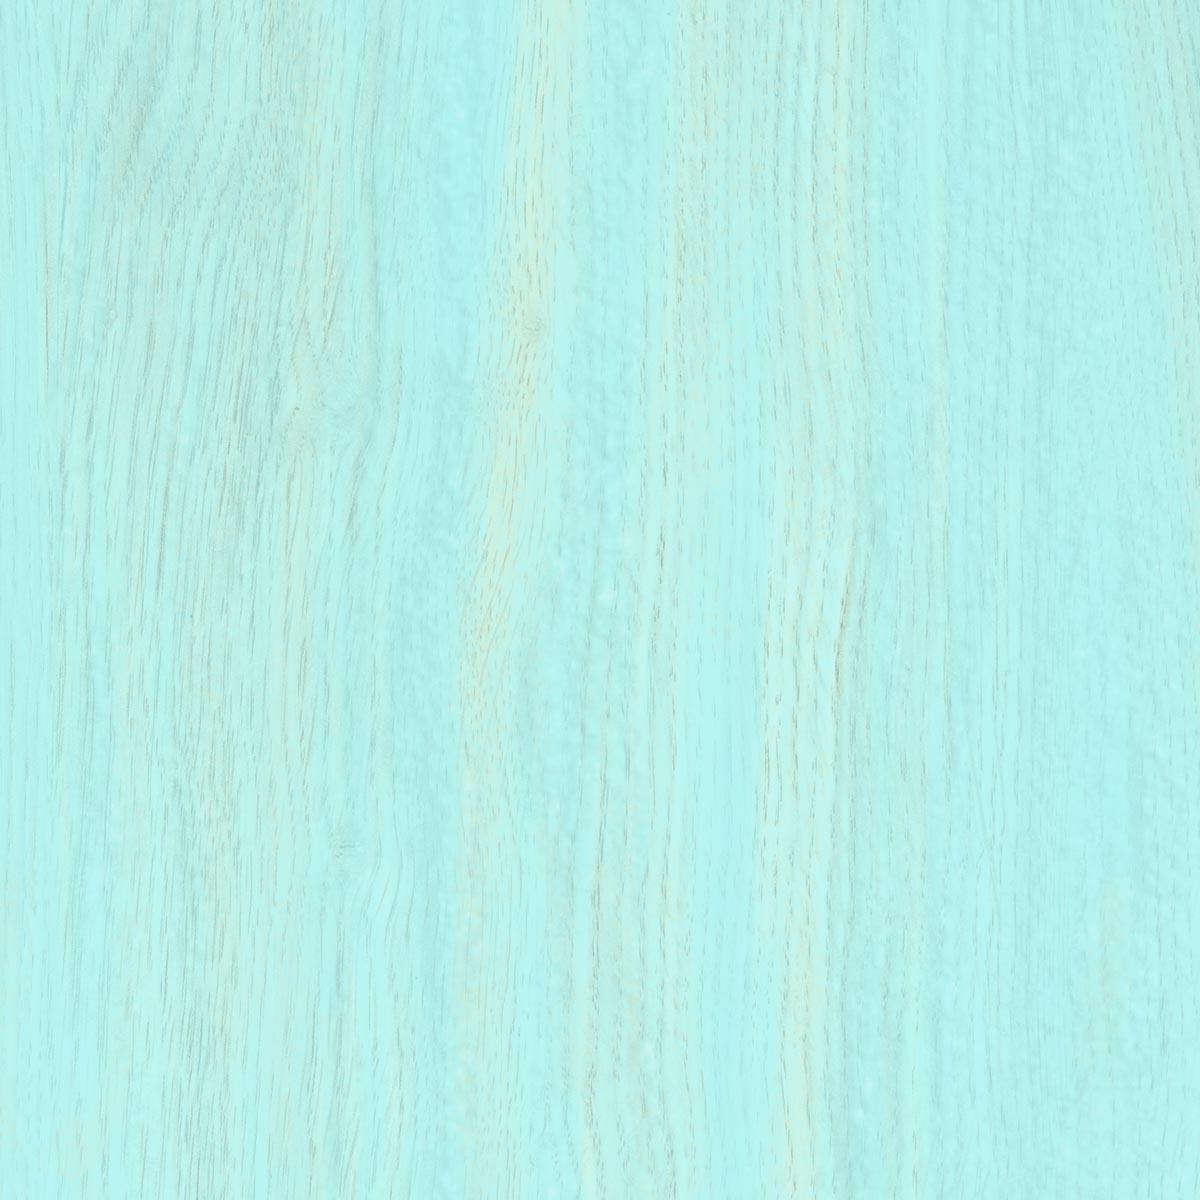 FolkArt ® Pickling Wash™ - Sea Glass, 8 oz.